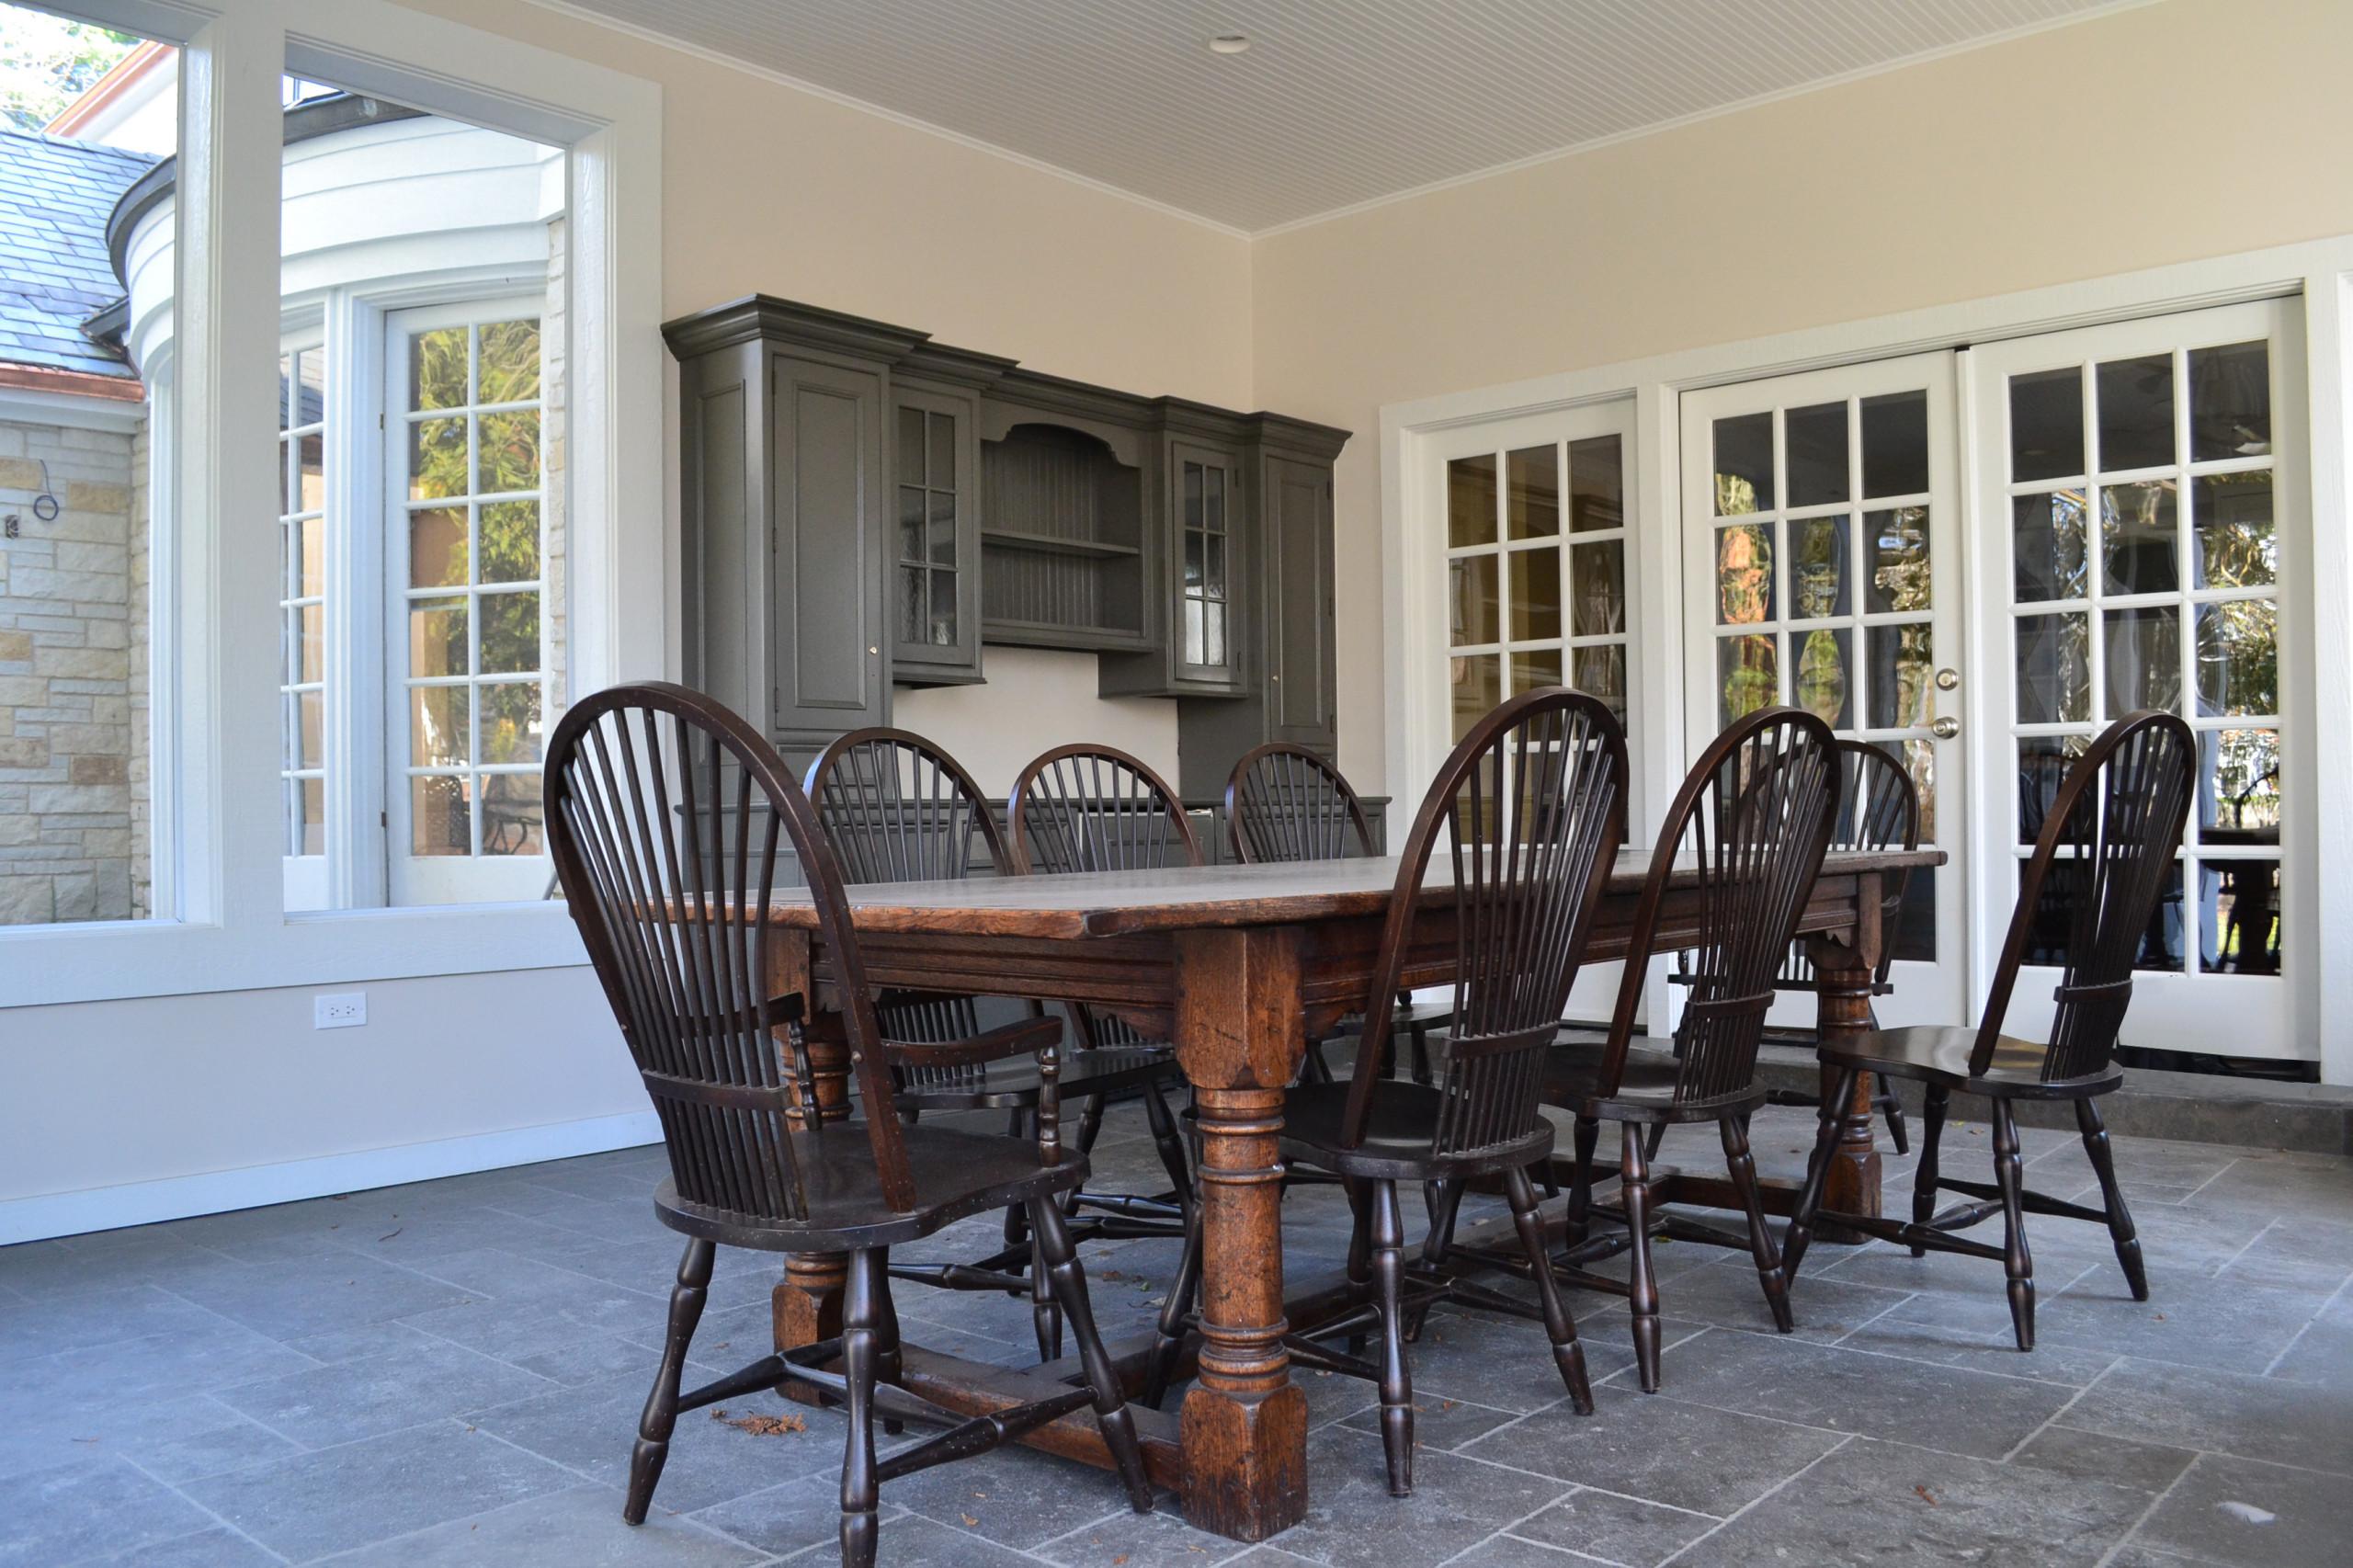 Three - season-room & Front entry porch